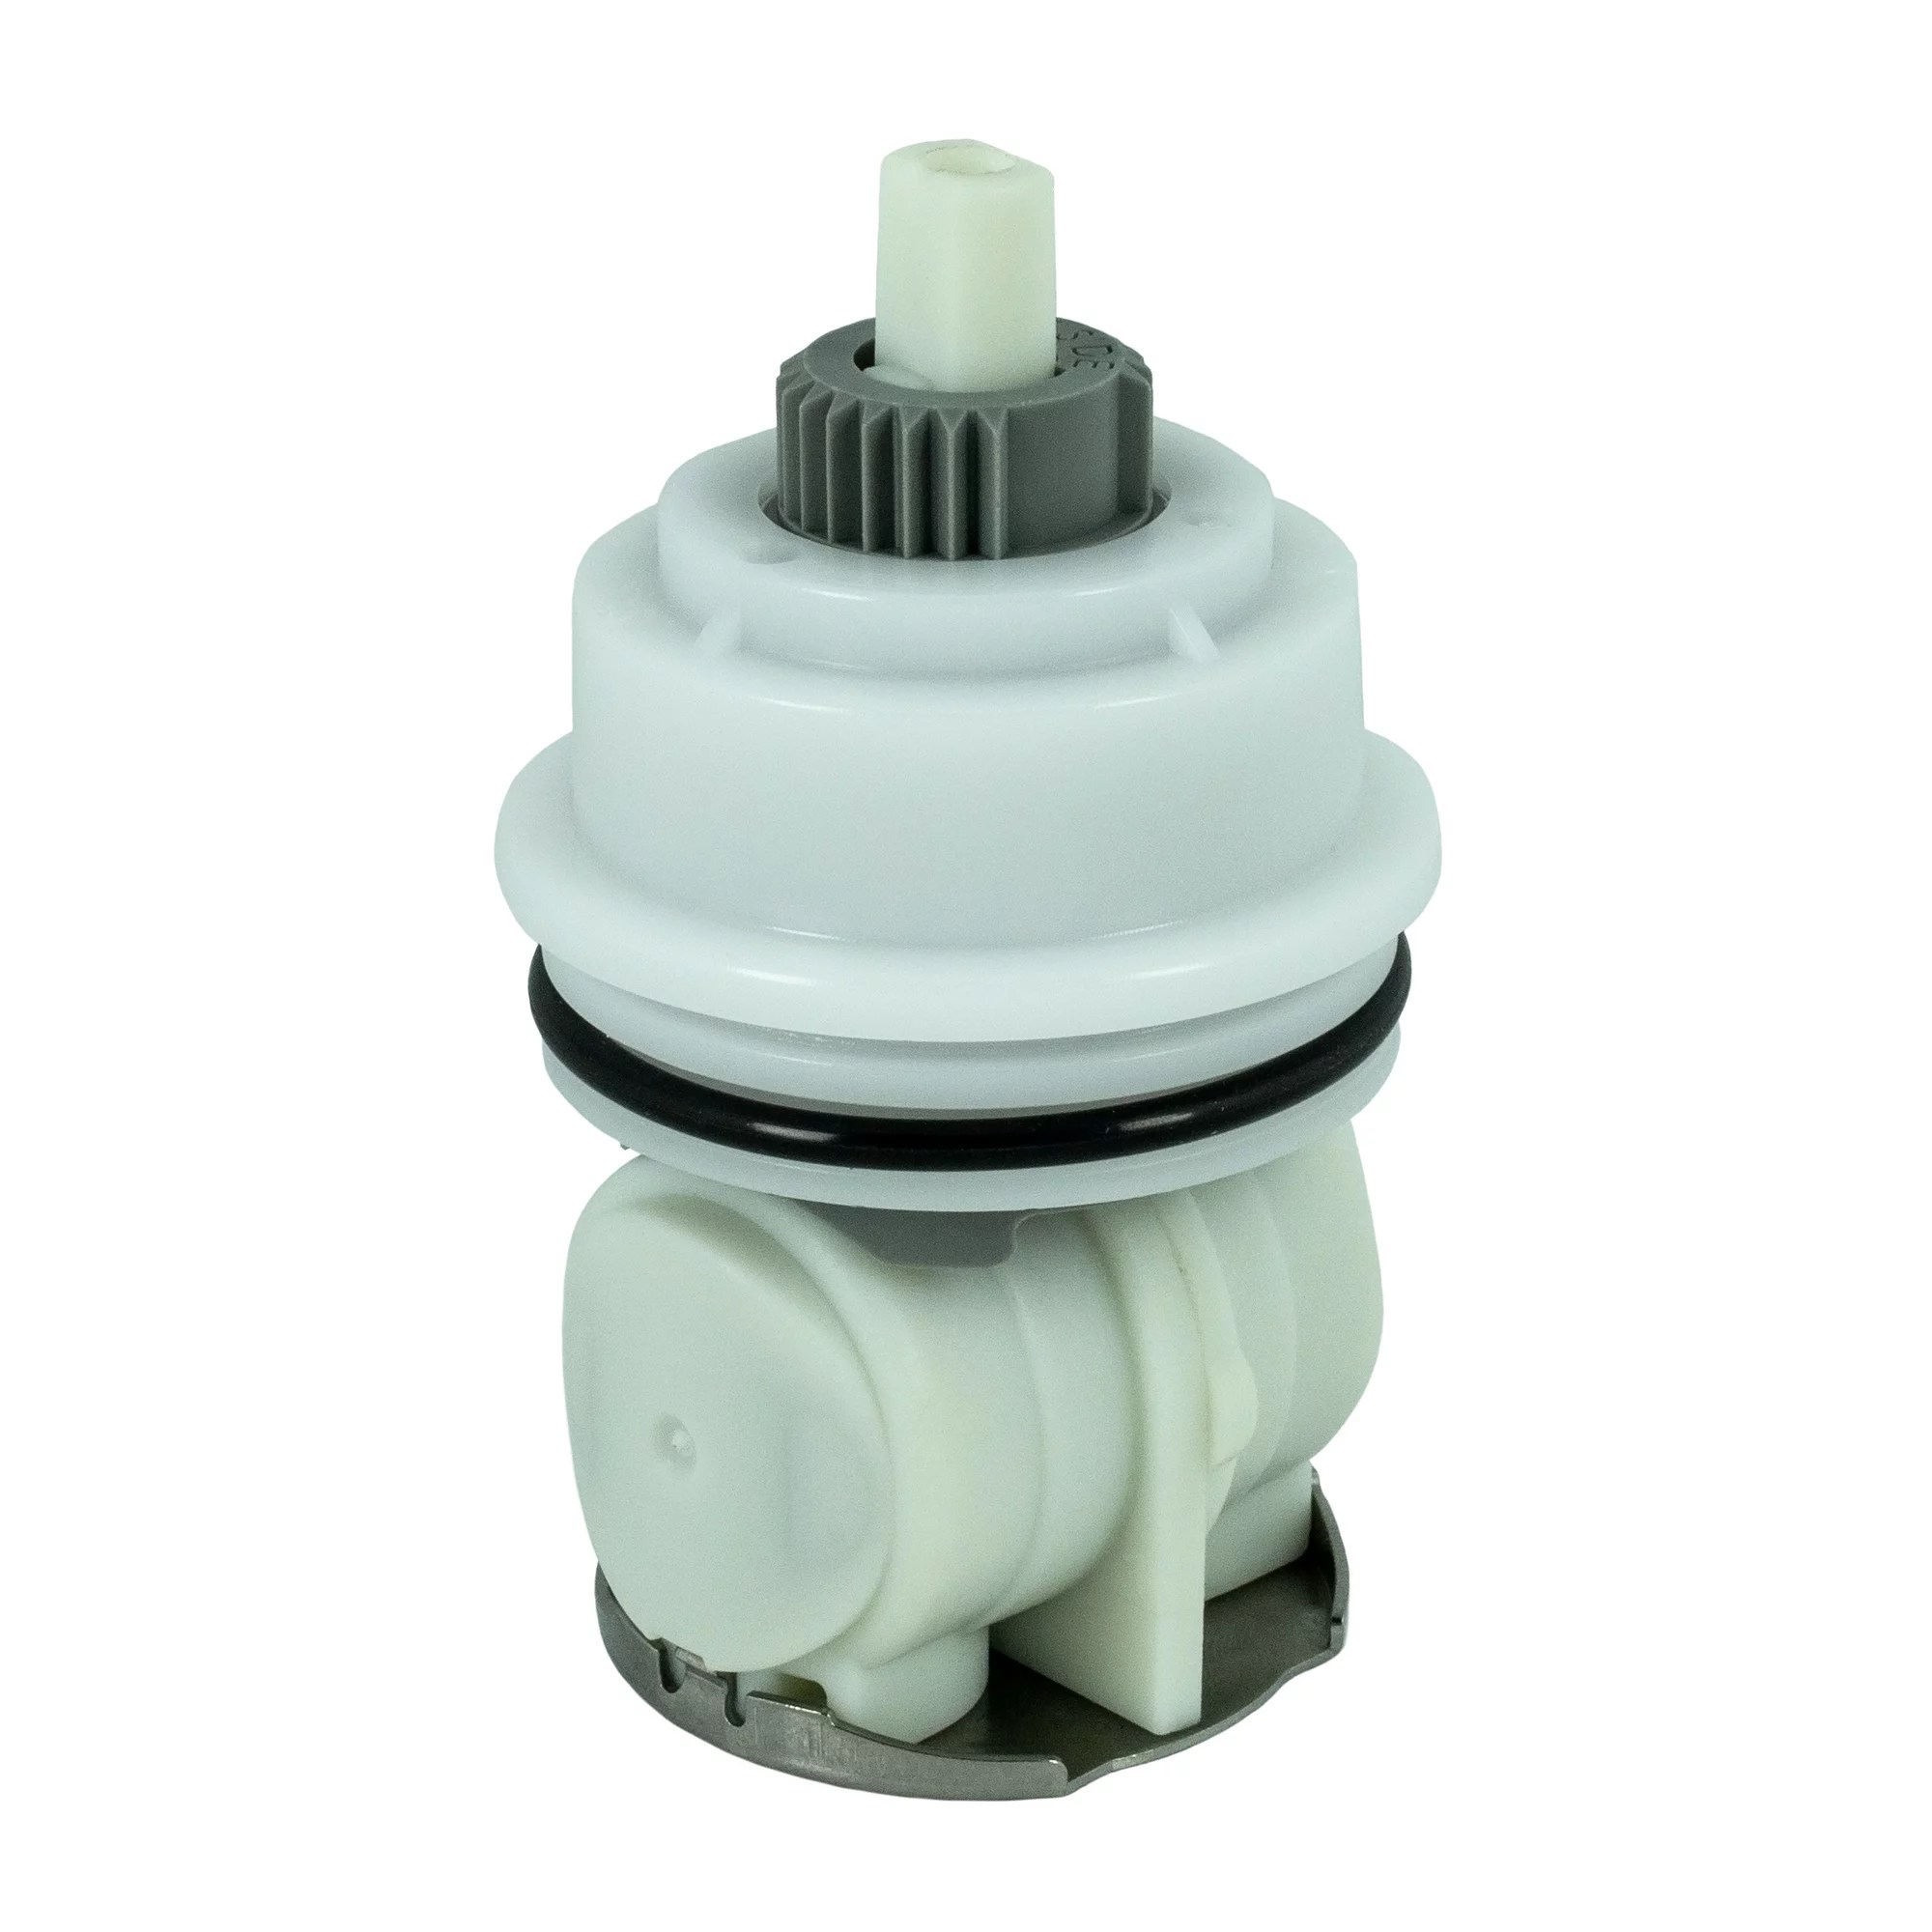 replacement cartridge for delta shower rp32104 1500 1700 series walmart com